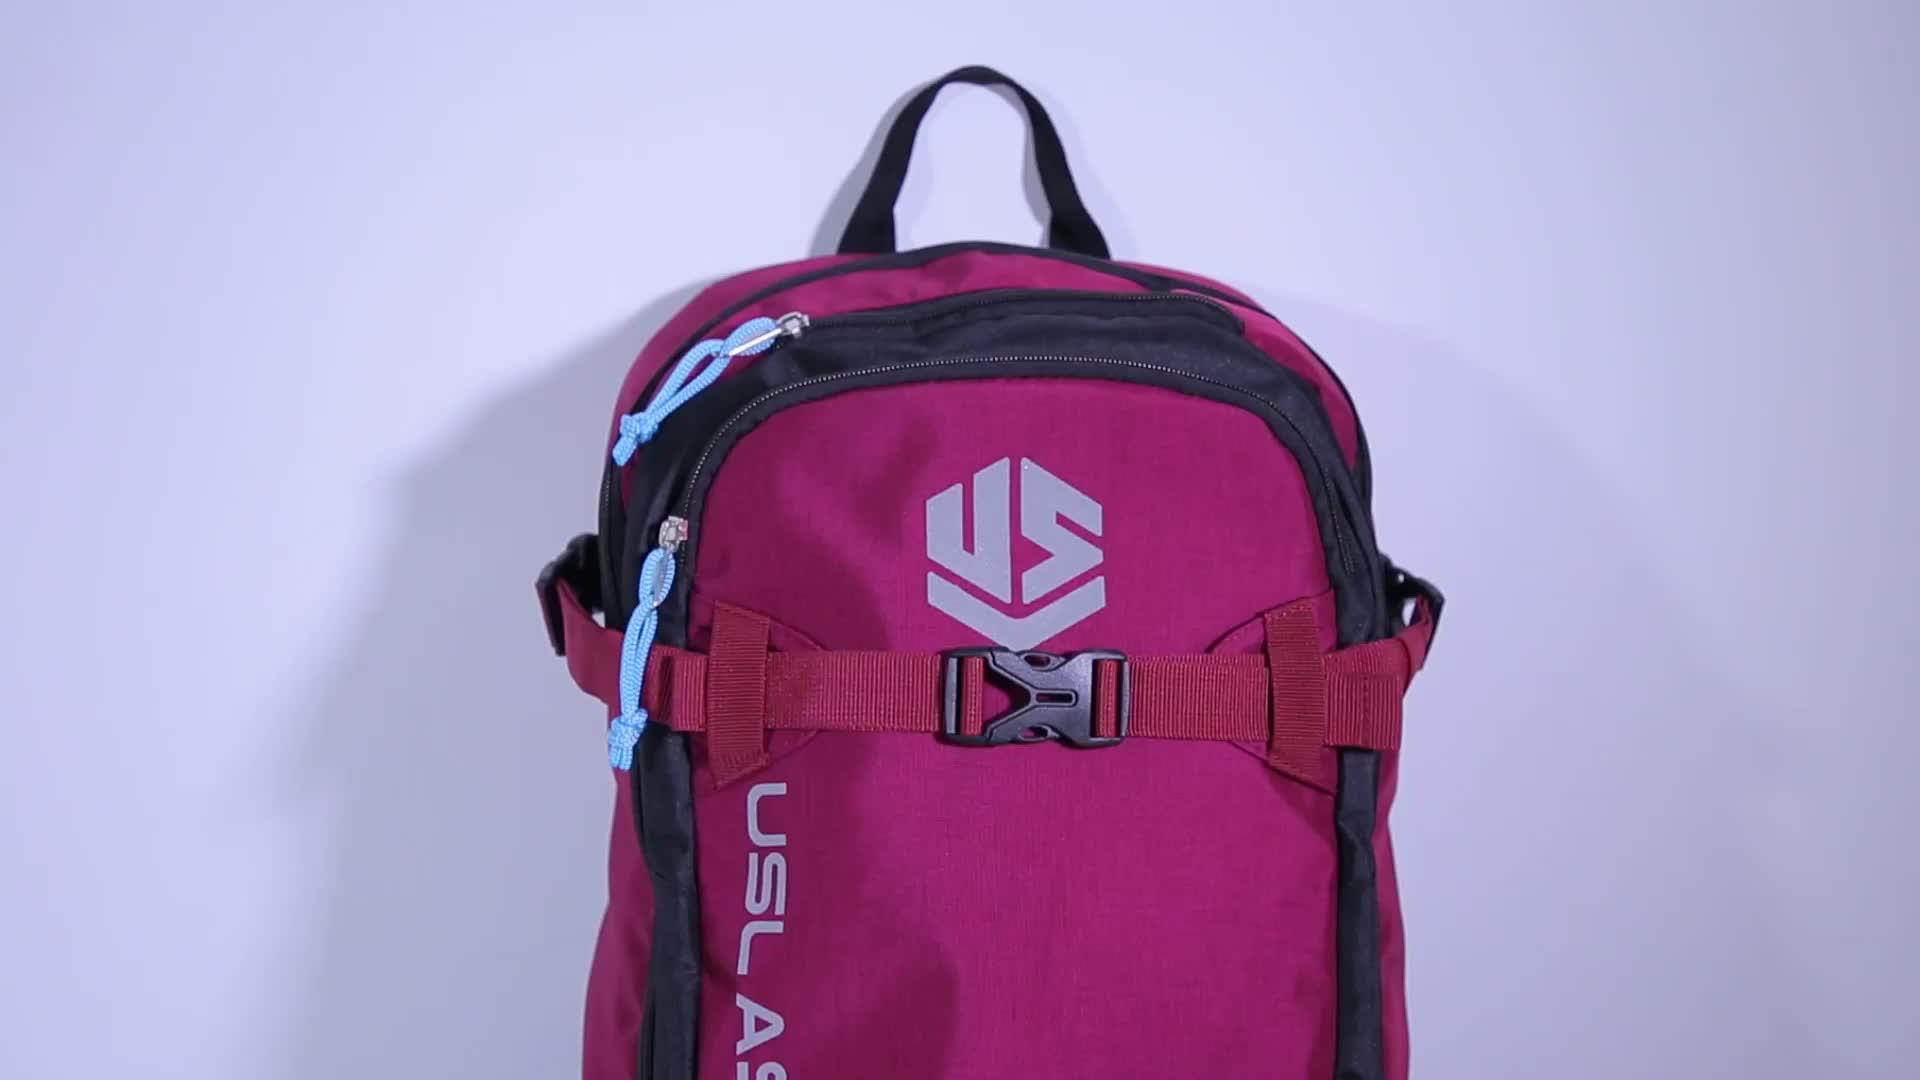 2020 0utdoor snowdrifter pack skateboard bag backpack with snowboard holder strap